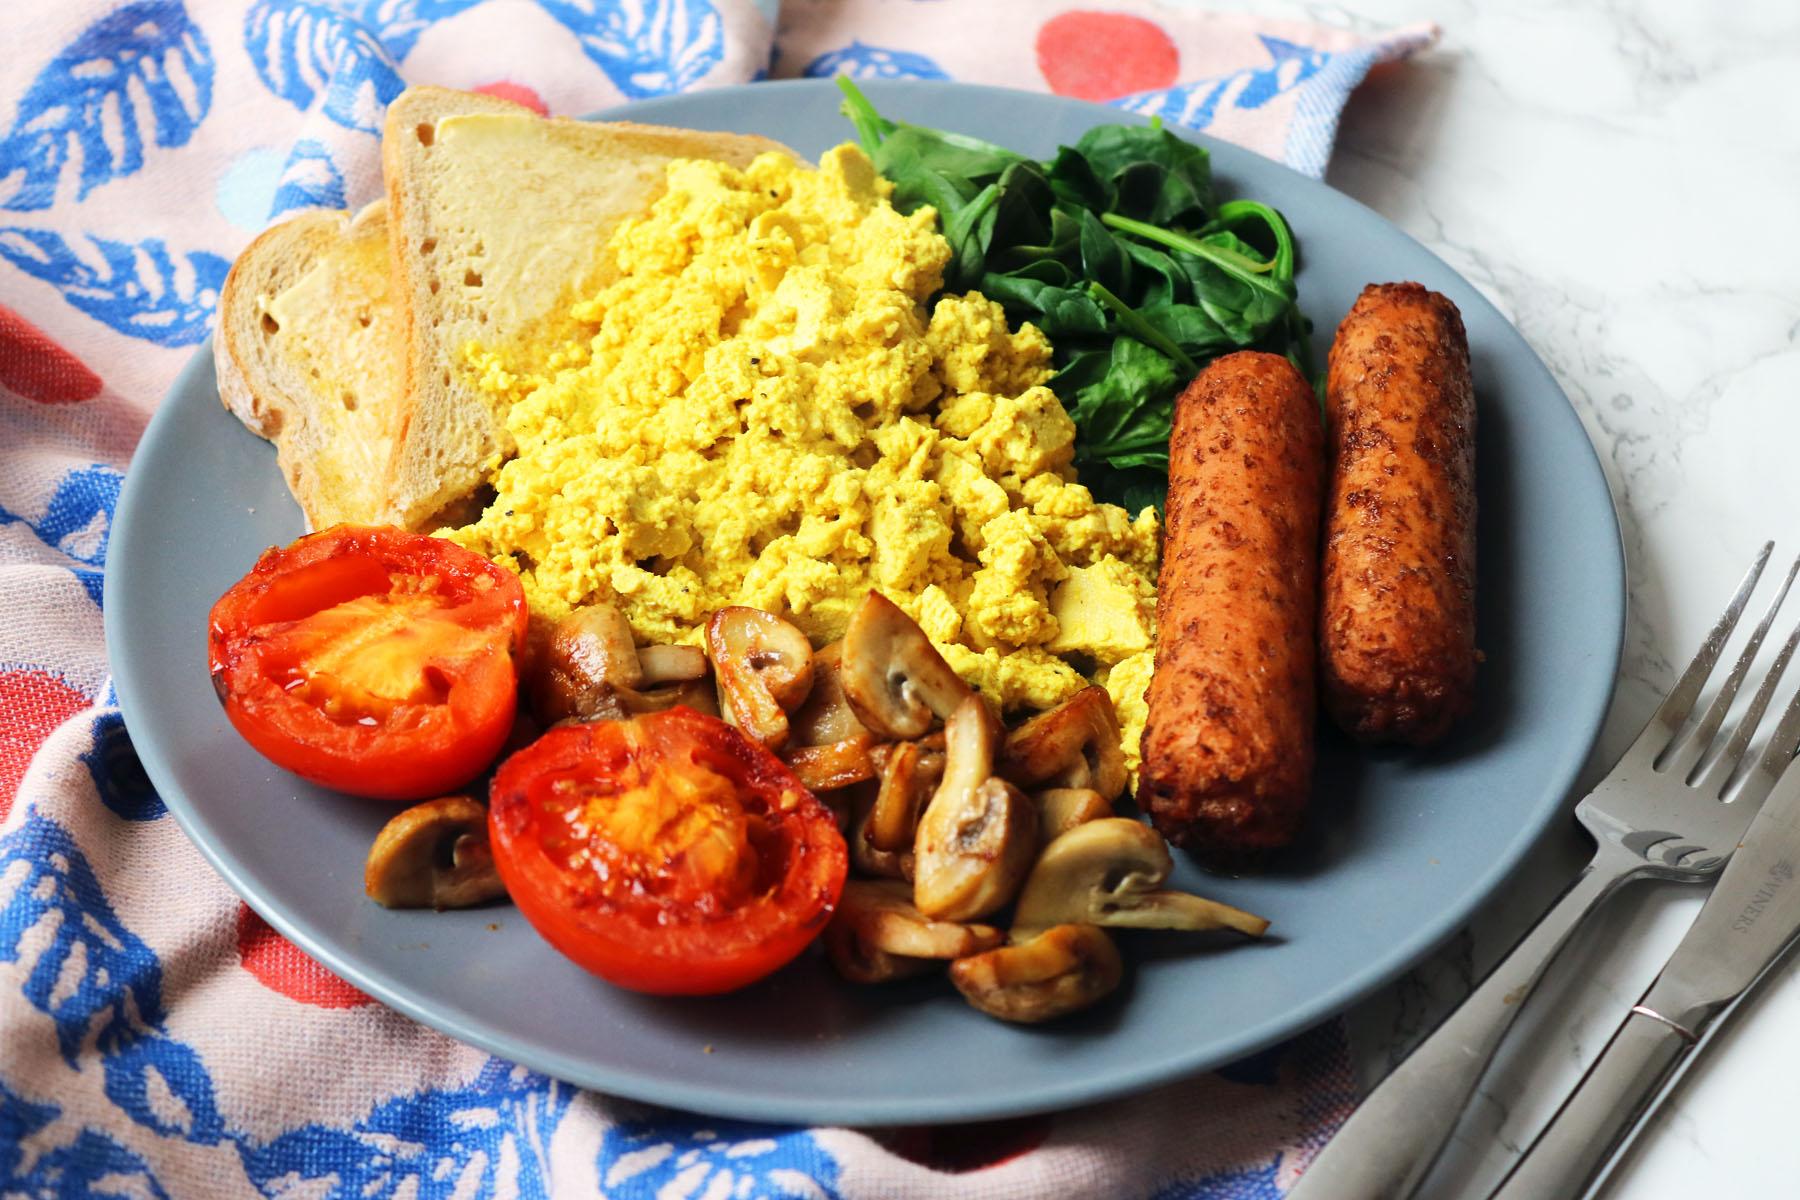 Vegan Full English Breakfast with Tofu Scramble